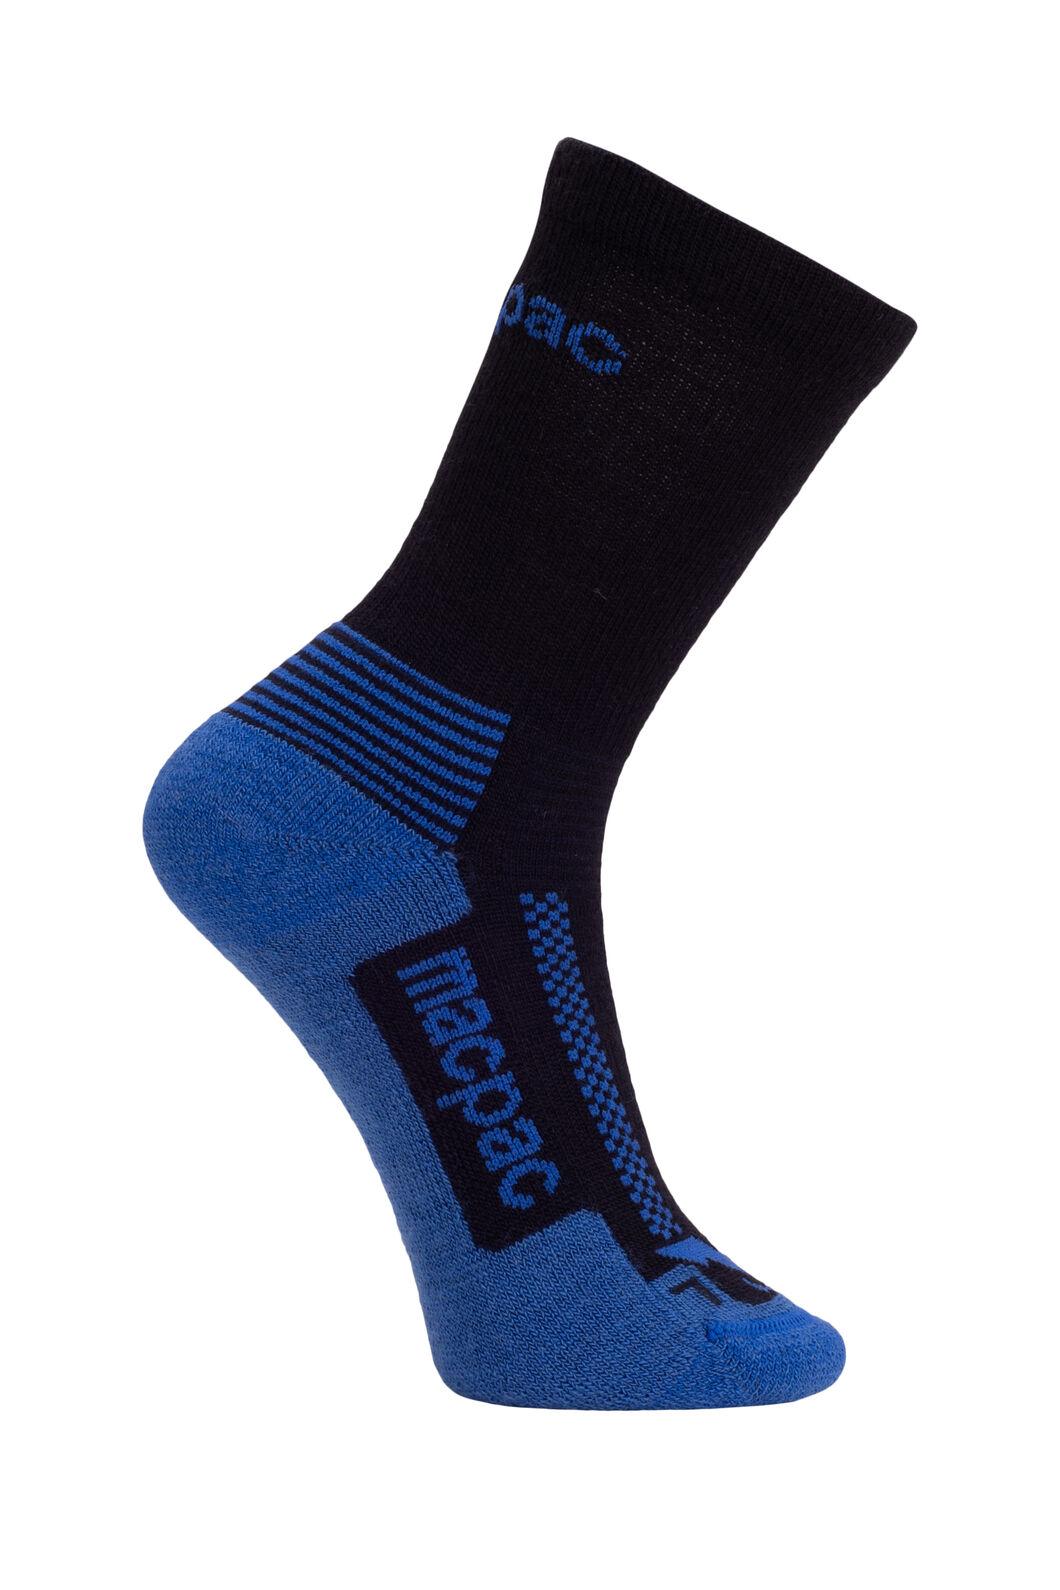 Macpac Kids' Trekking Socks, Navy/Classic Blue, hi-res